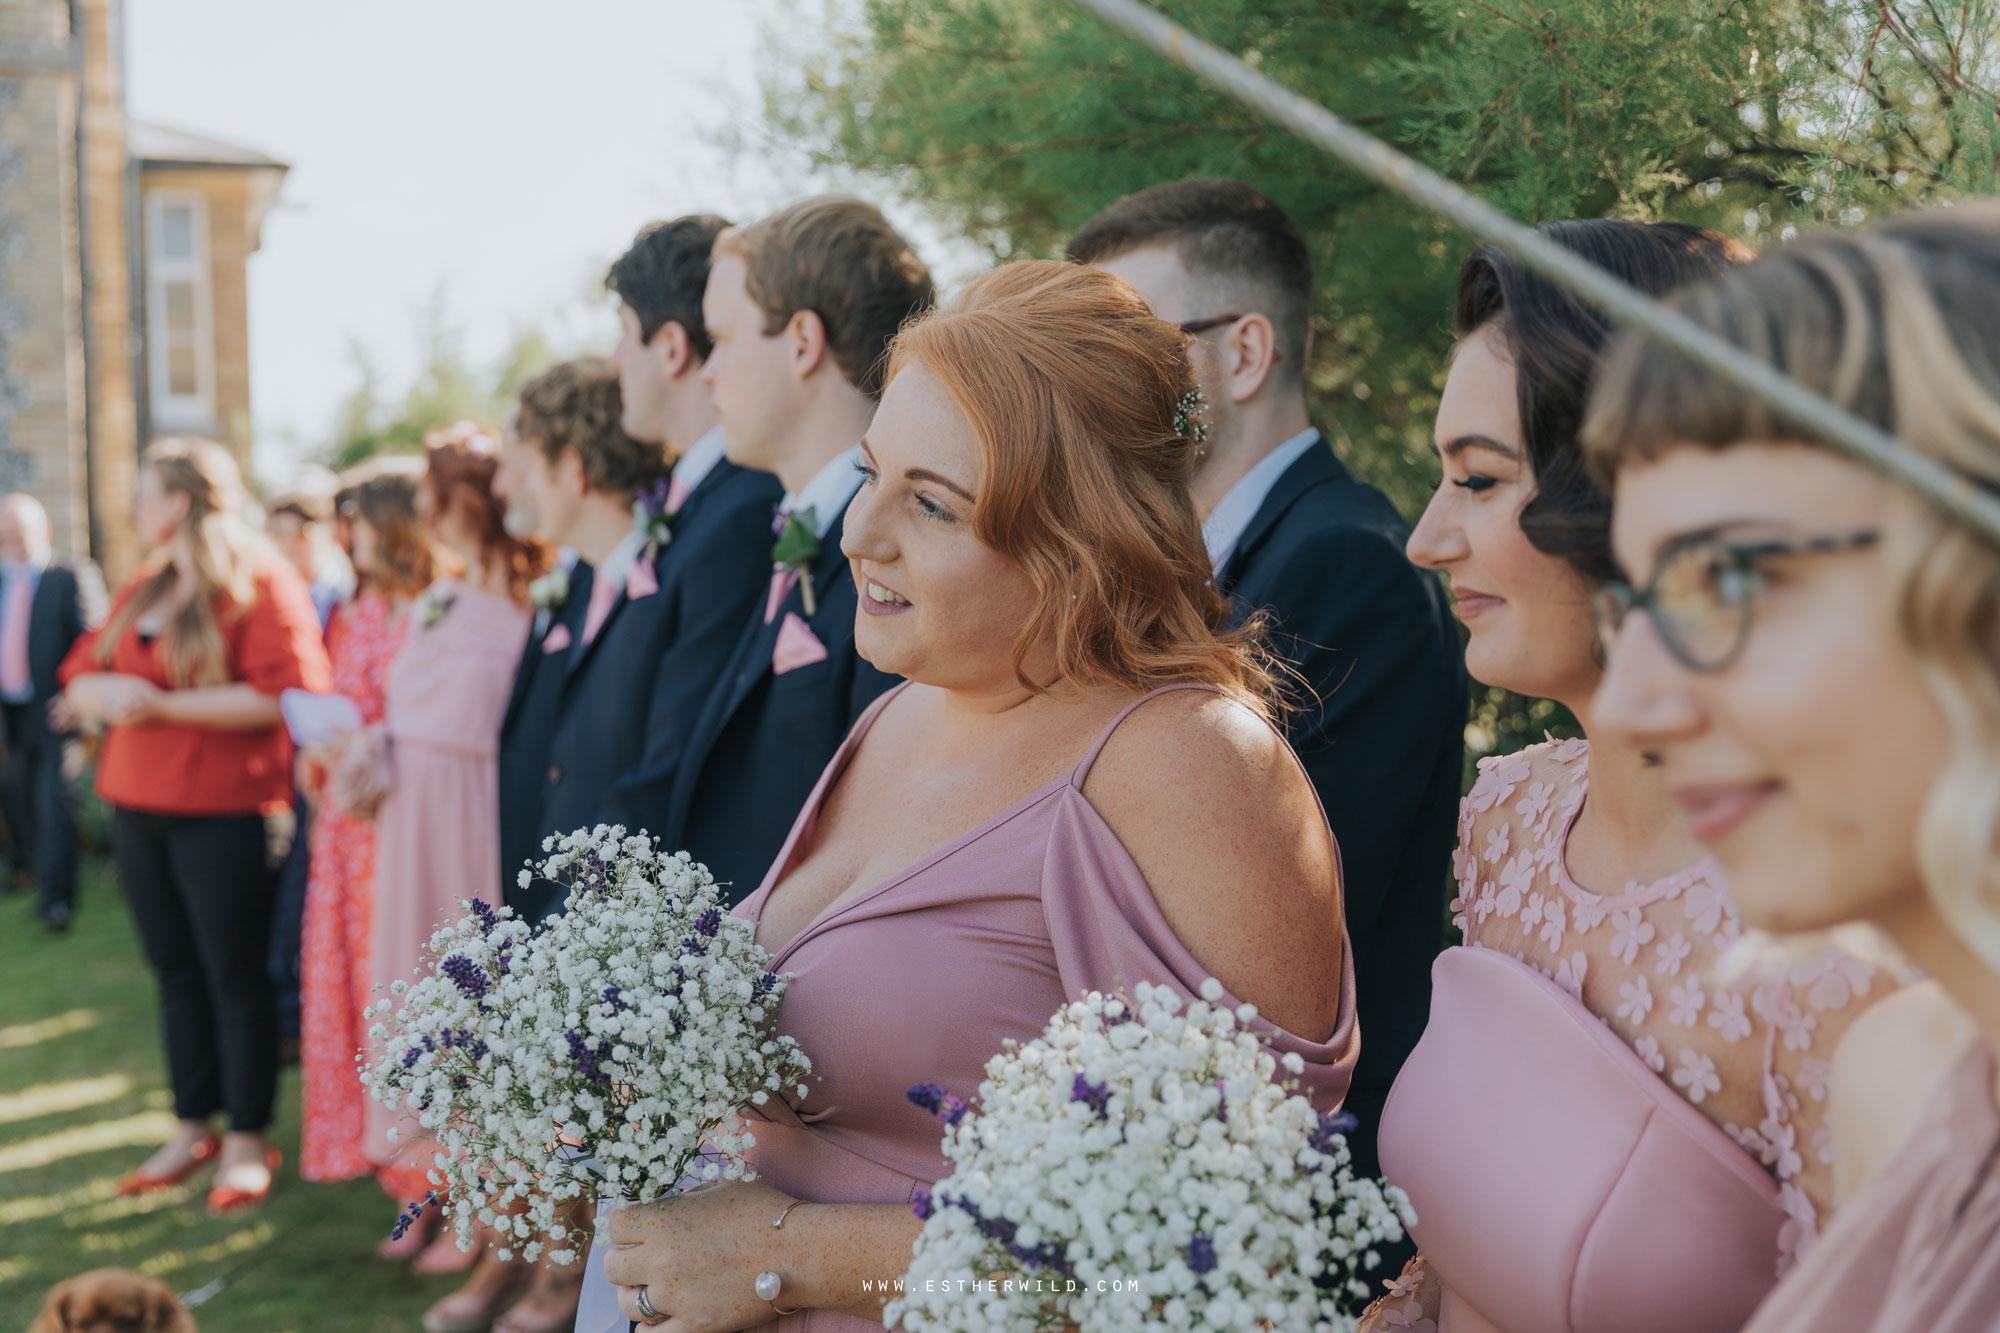 Cromer_Wedding_Beach_Outdoor_Ceremony_Norfolk_North_Lodge_Registry_Office_Rocket_House_Cafe_Cromer_Pier_IMG_3720.jpg